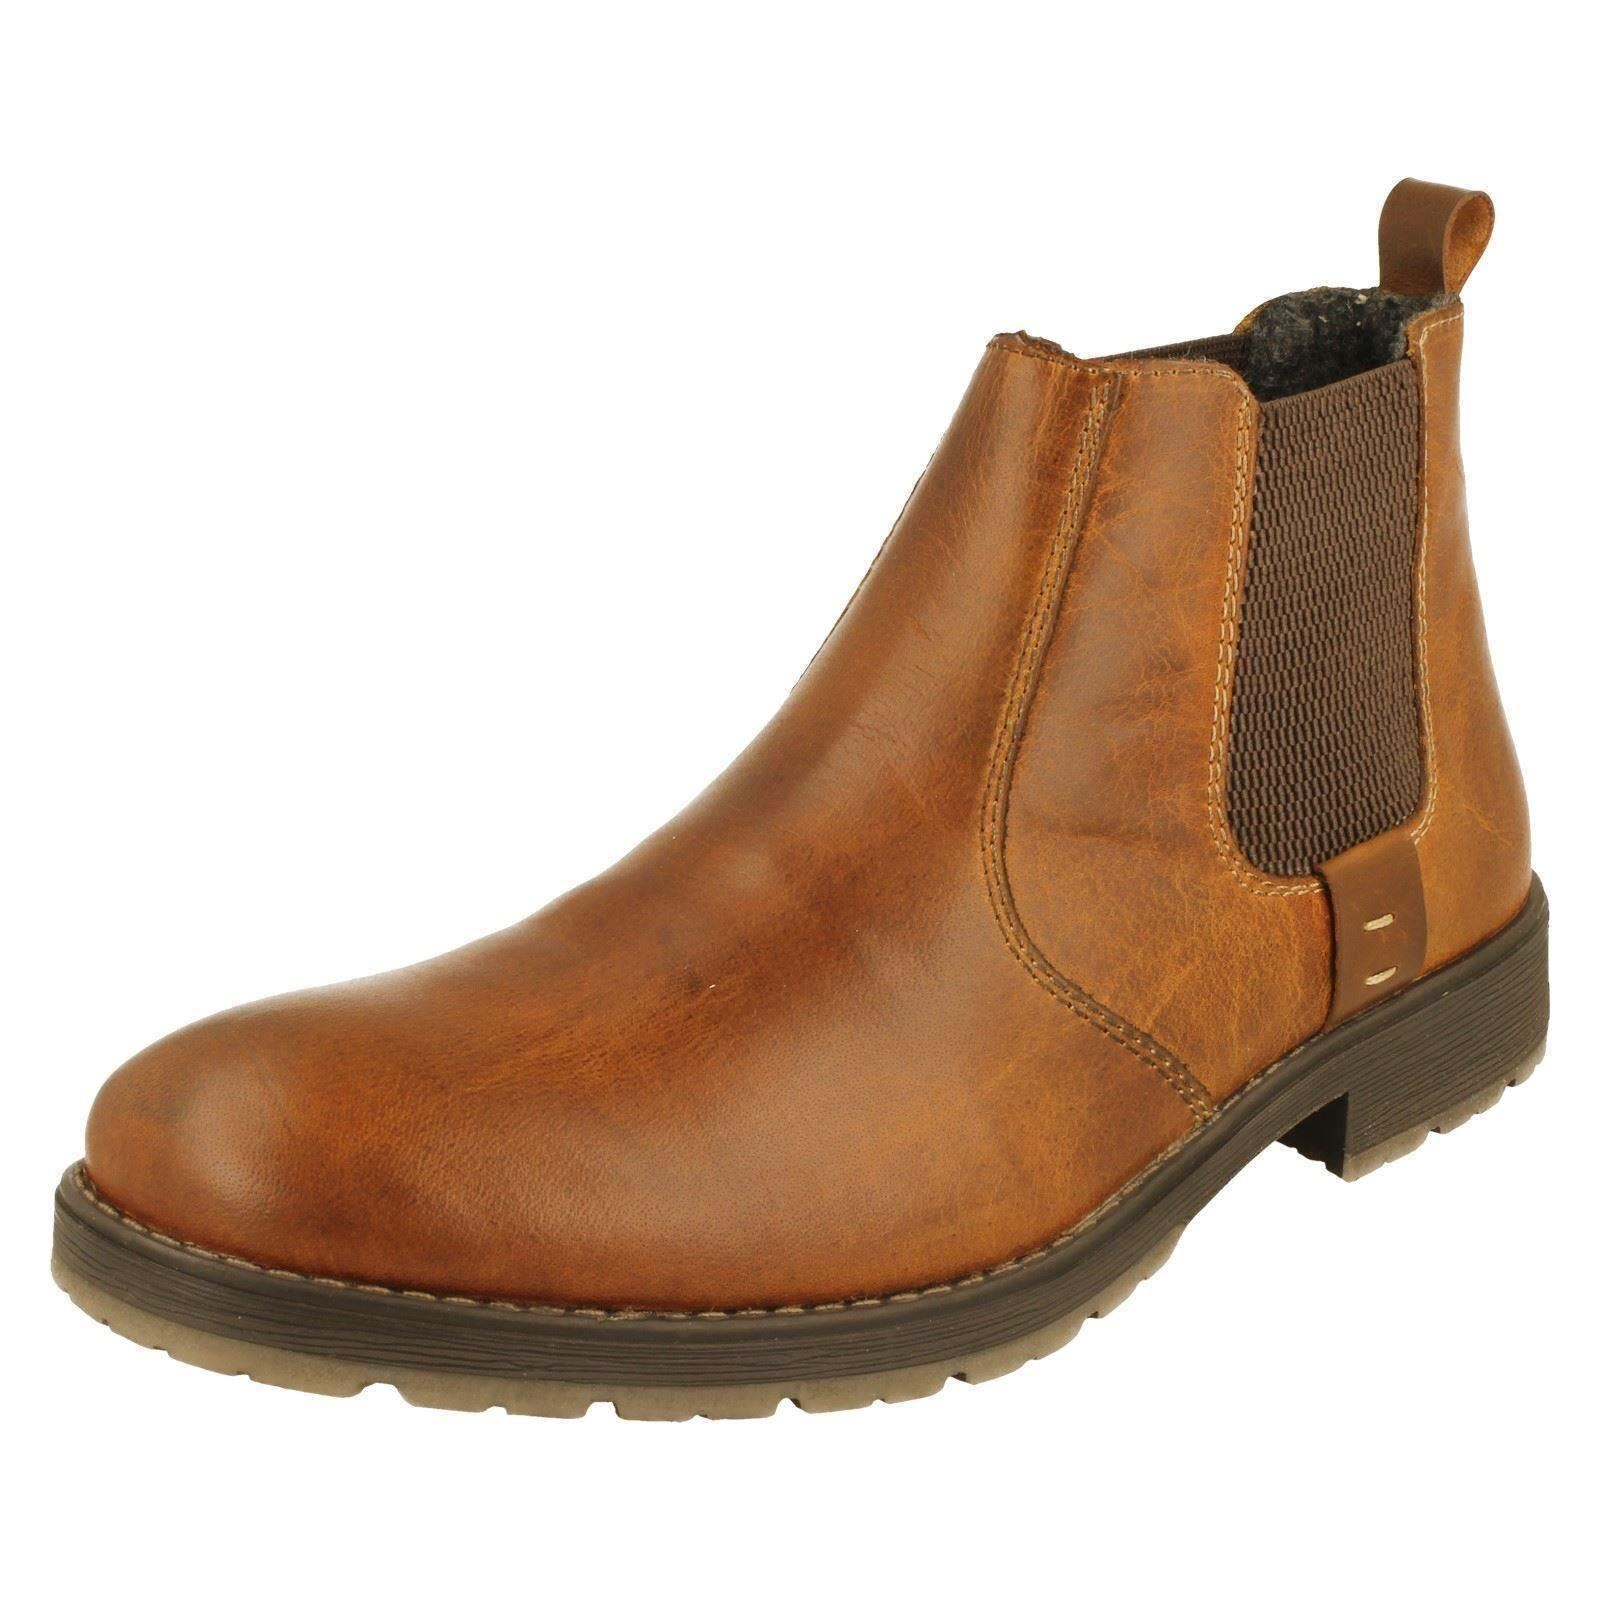 Mens Rieker Rieker Mens Boots The Style 33353-W b71a6f